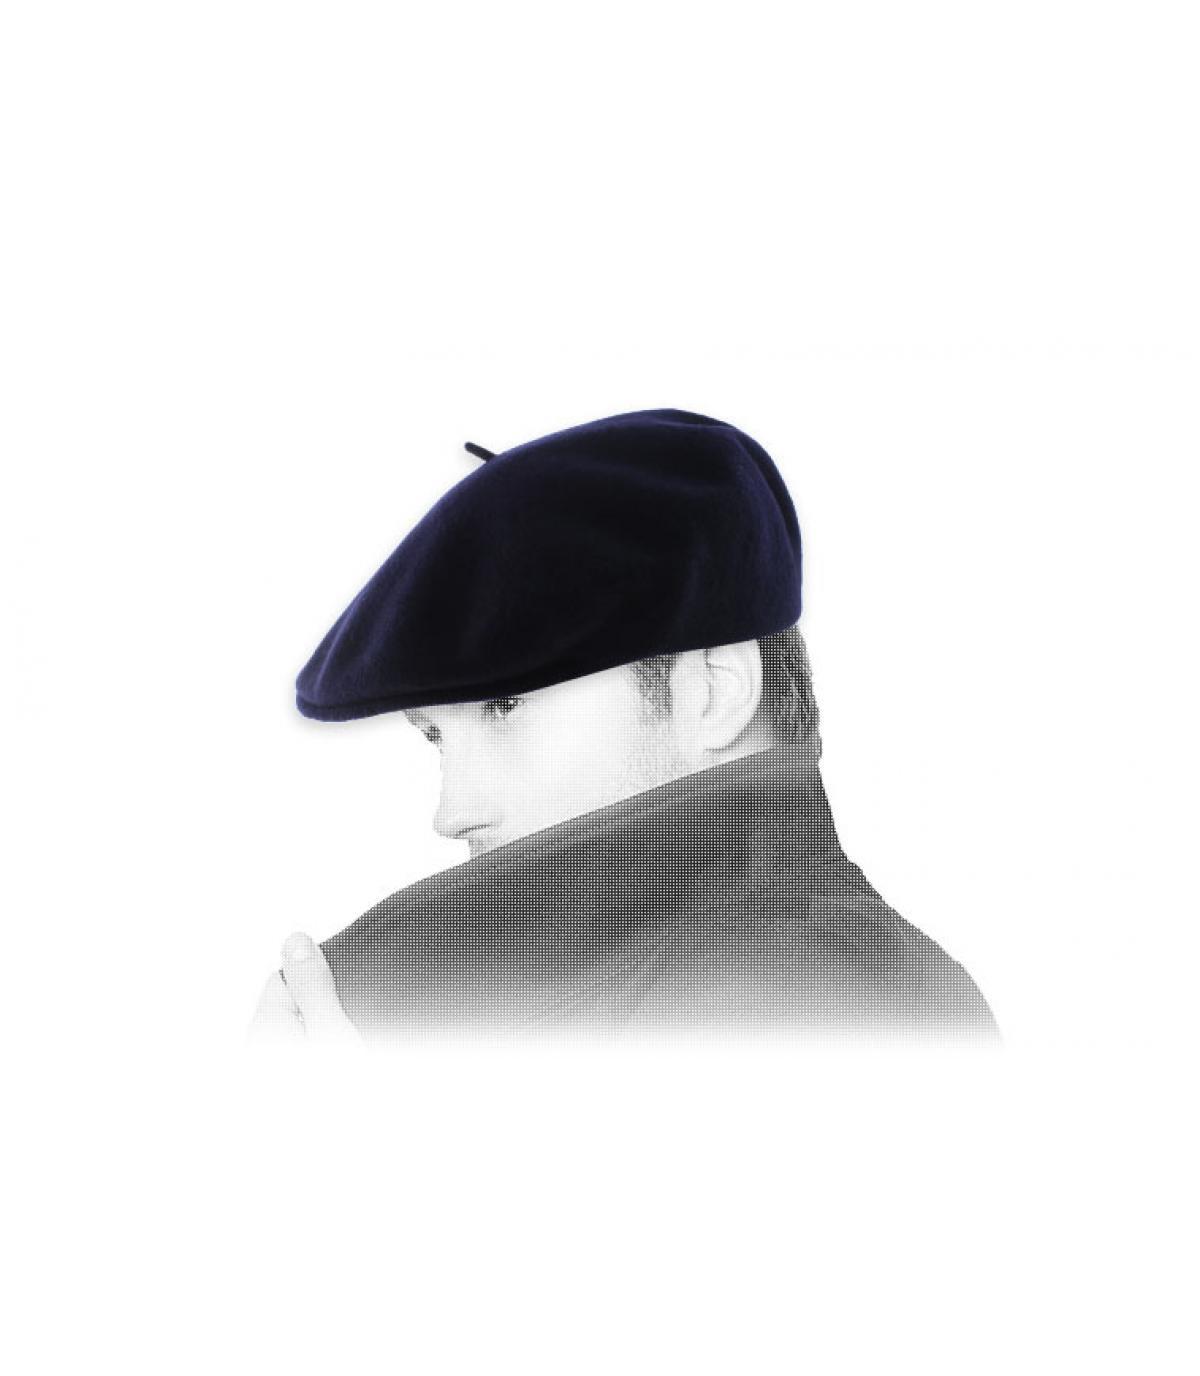 Barett marineblau Laulhère